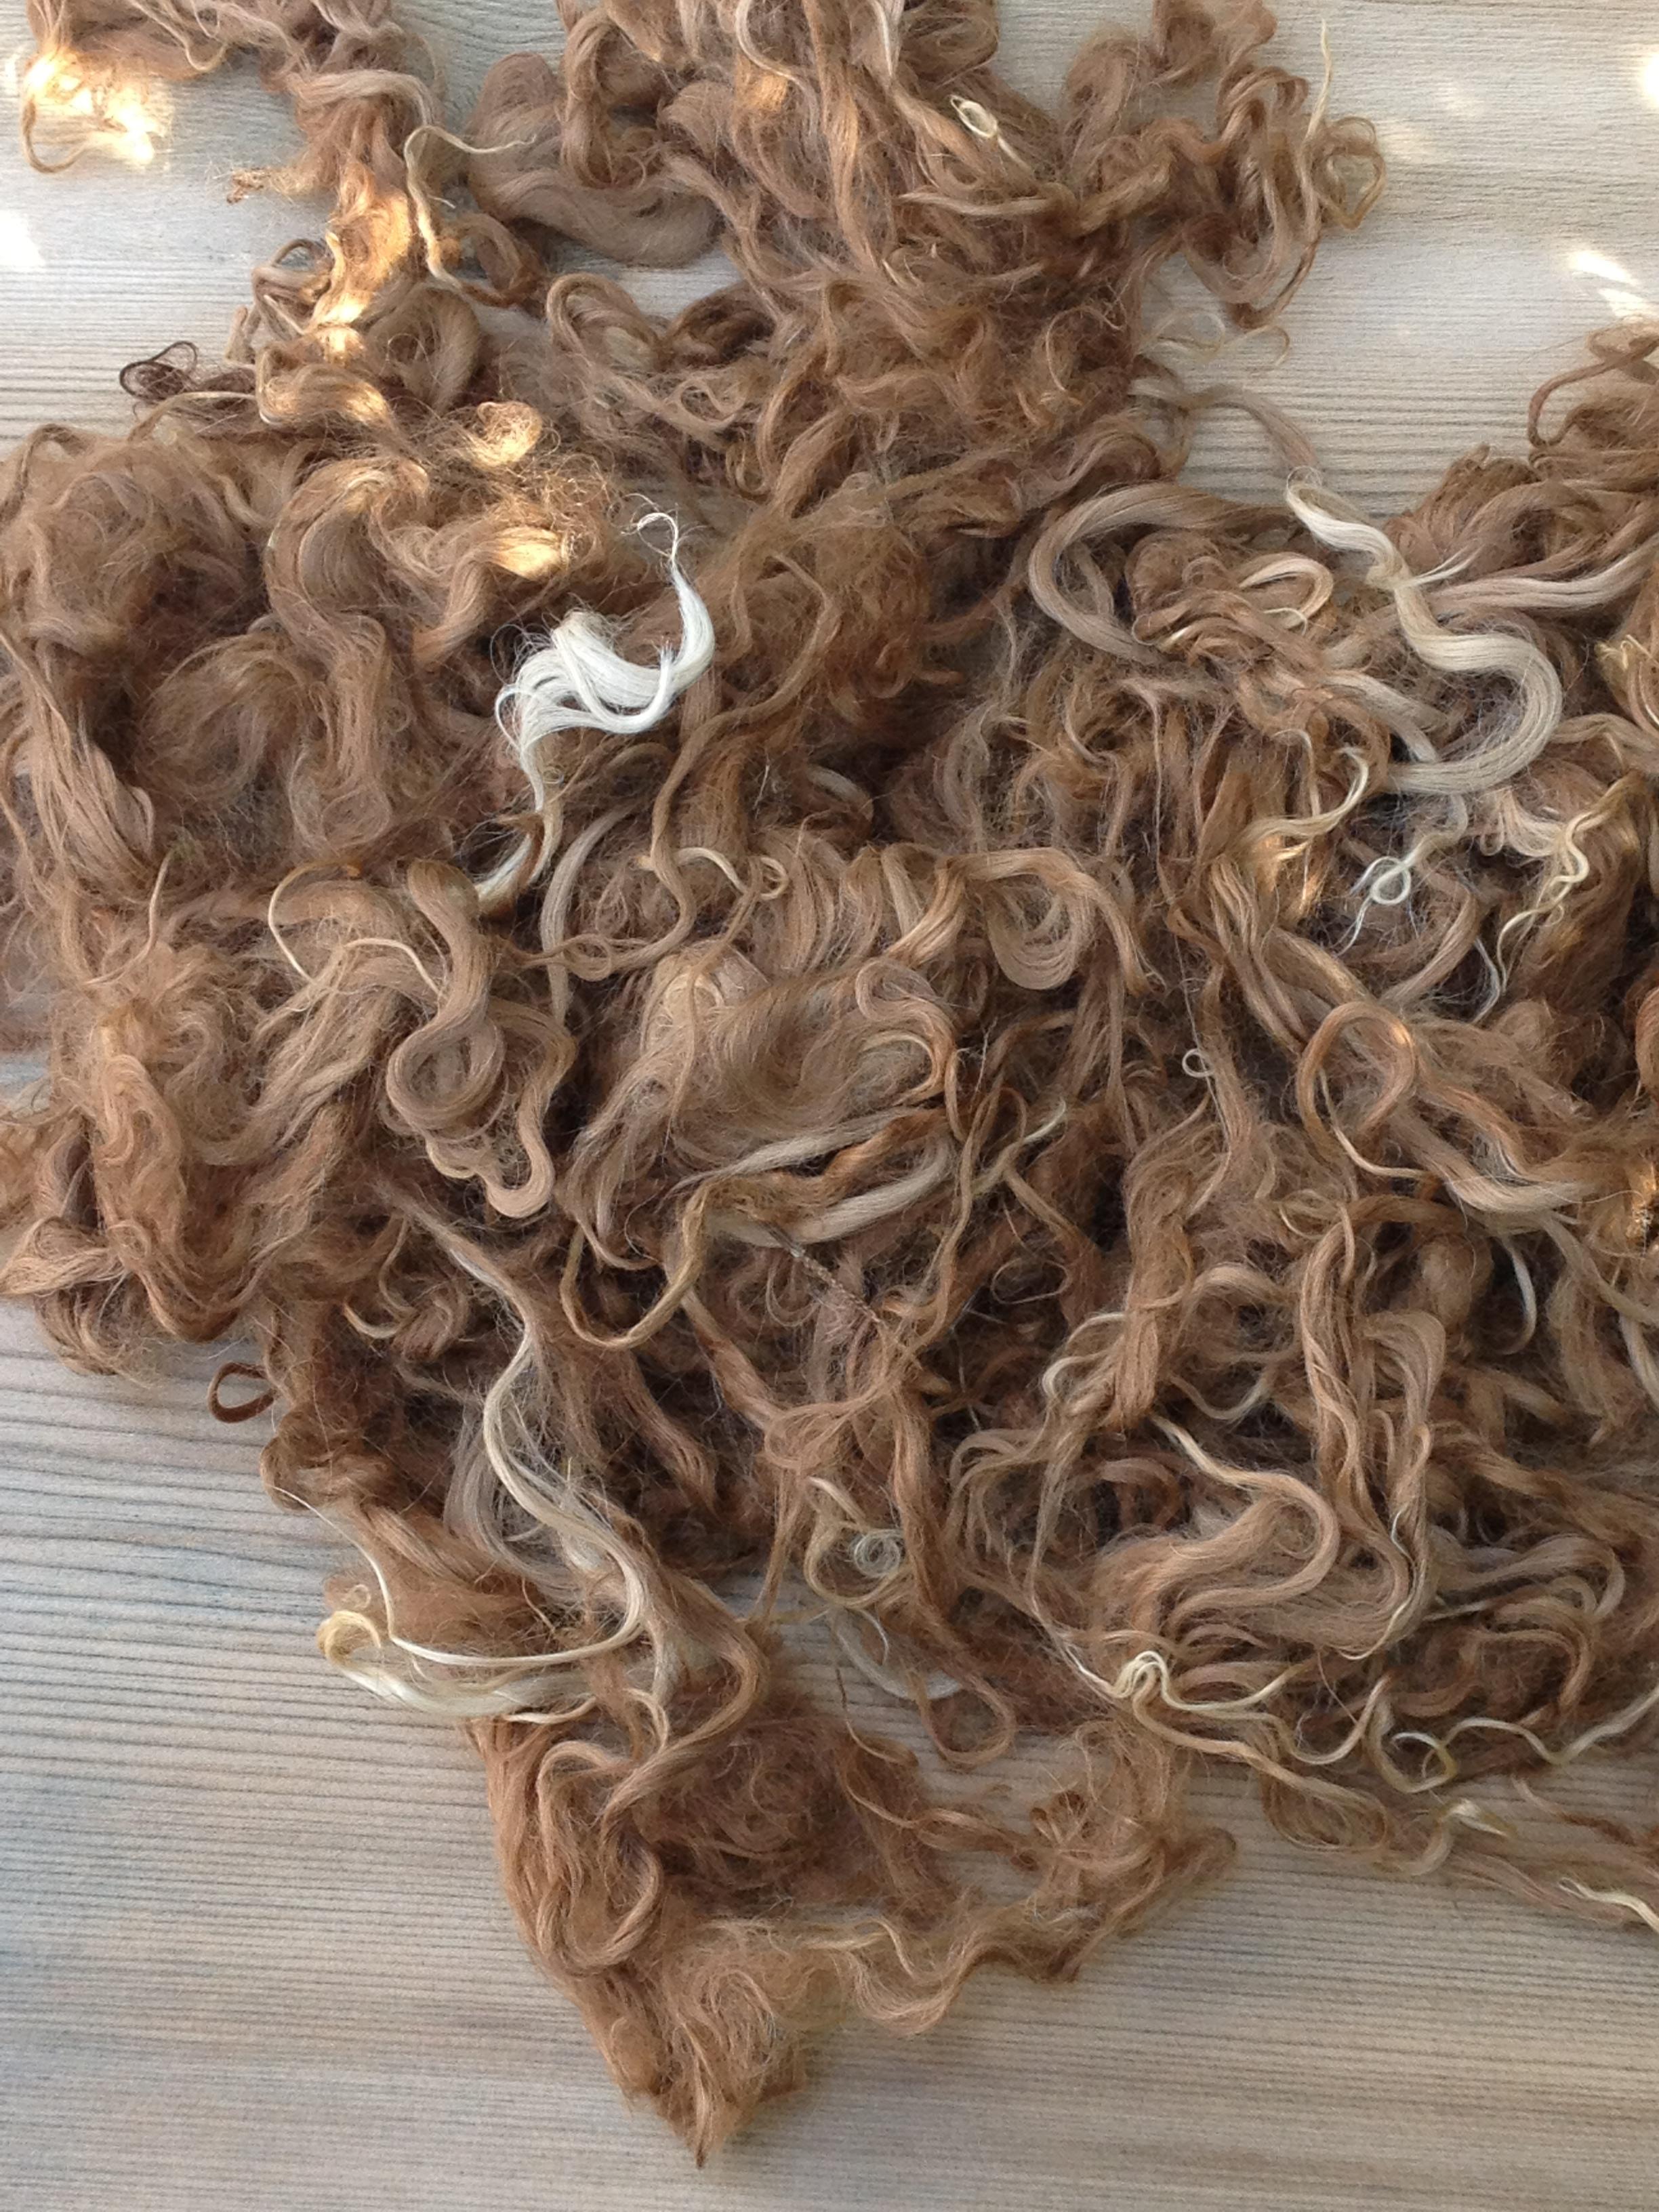 Suri Alpaca Fiber, 5 Inches, Light/Medium Fawn, Martha